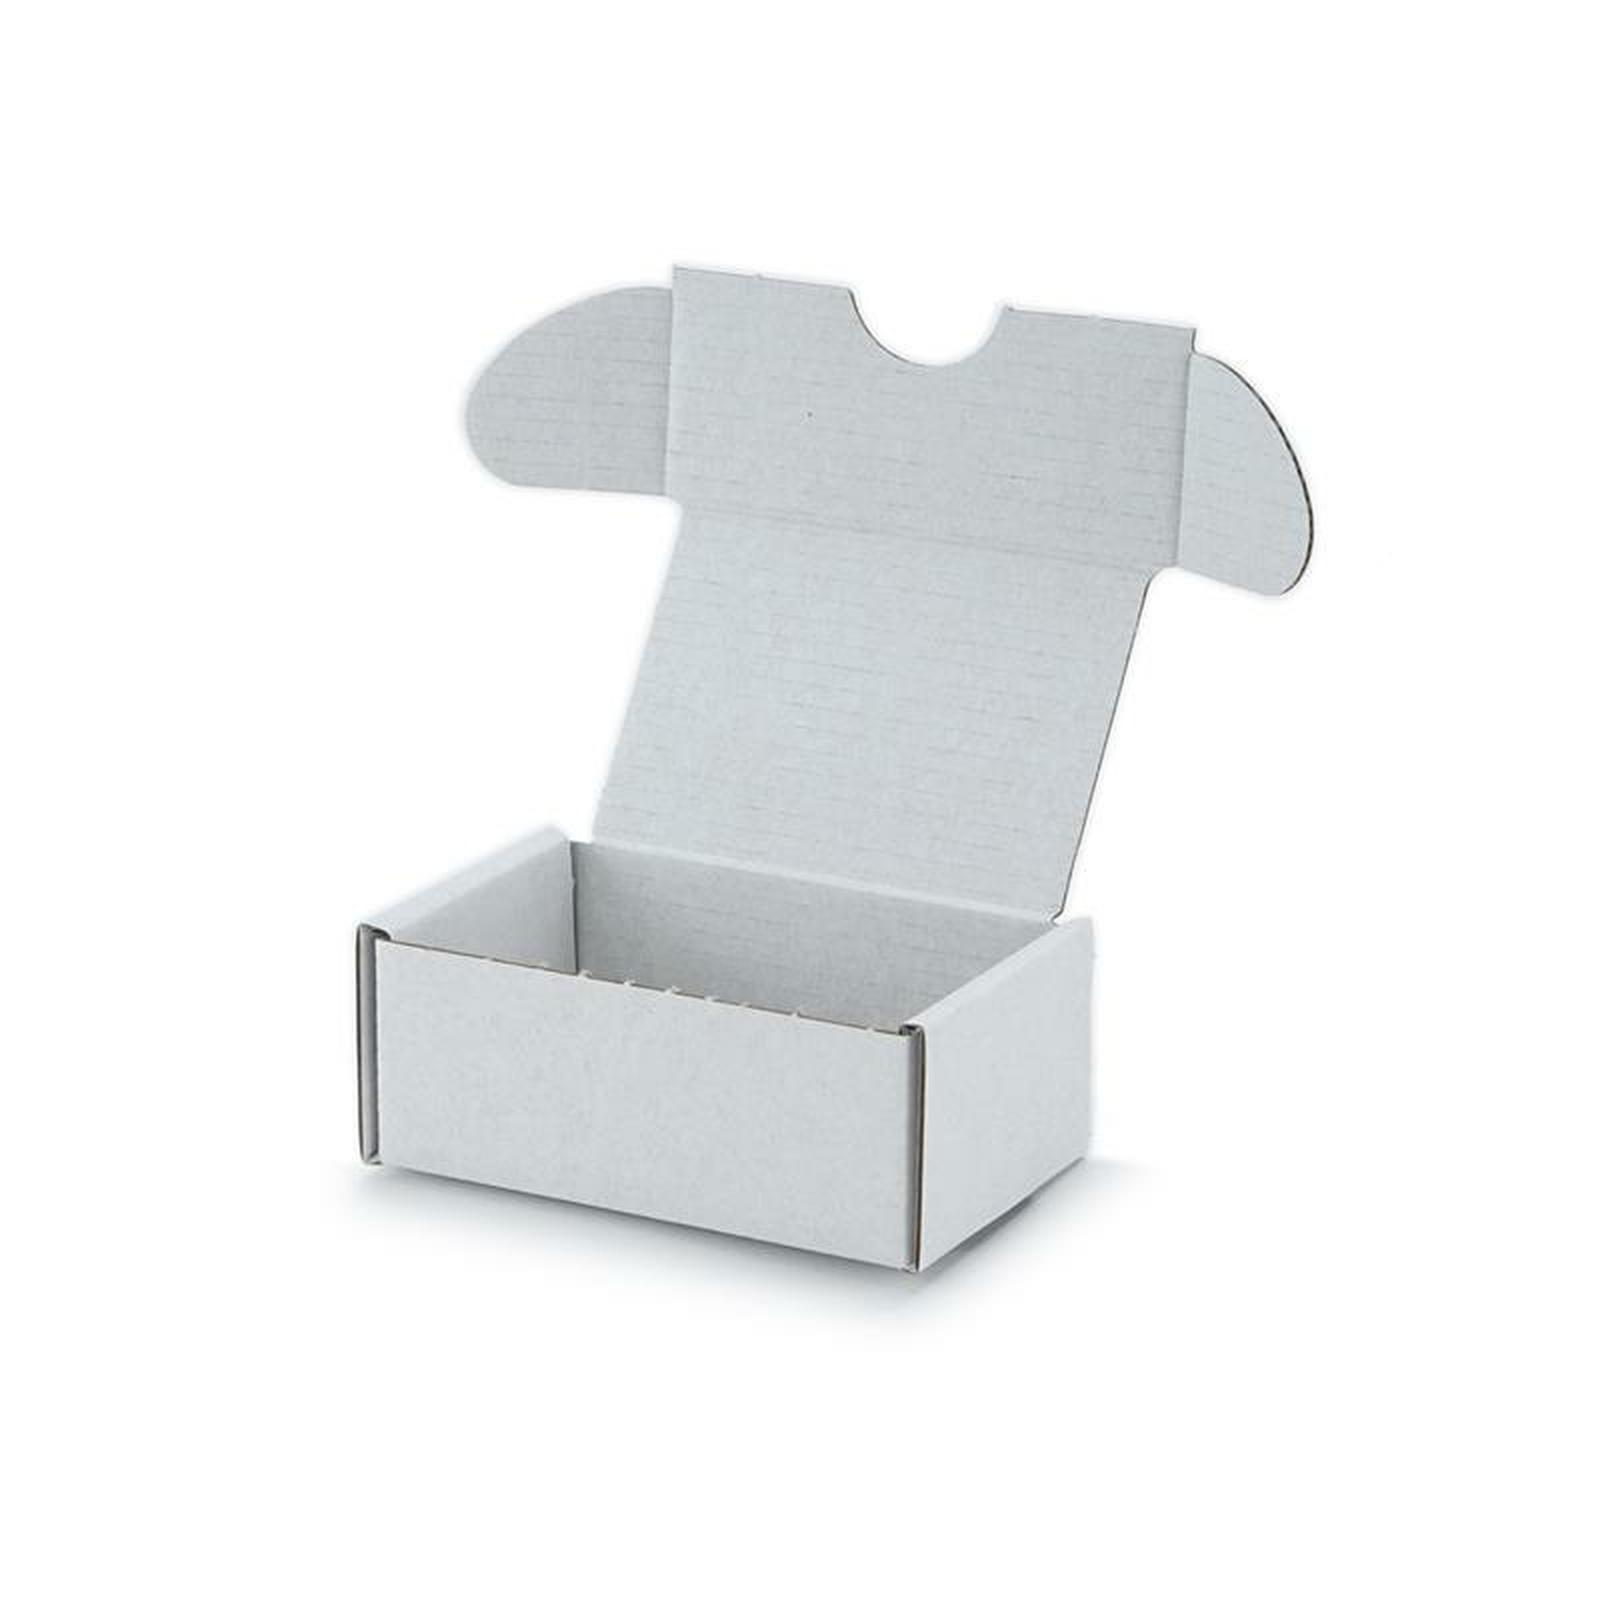 visitenkarten karton 90x60x40 mm g nstig kaufen 0 13. Black Bedroom Furniture Sets. Home Design Ideas